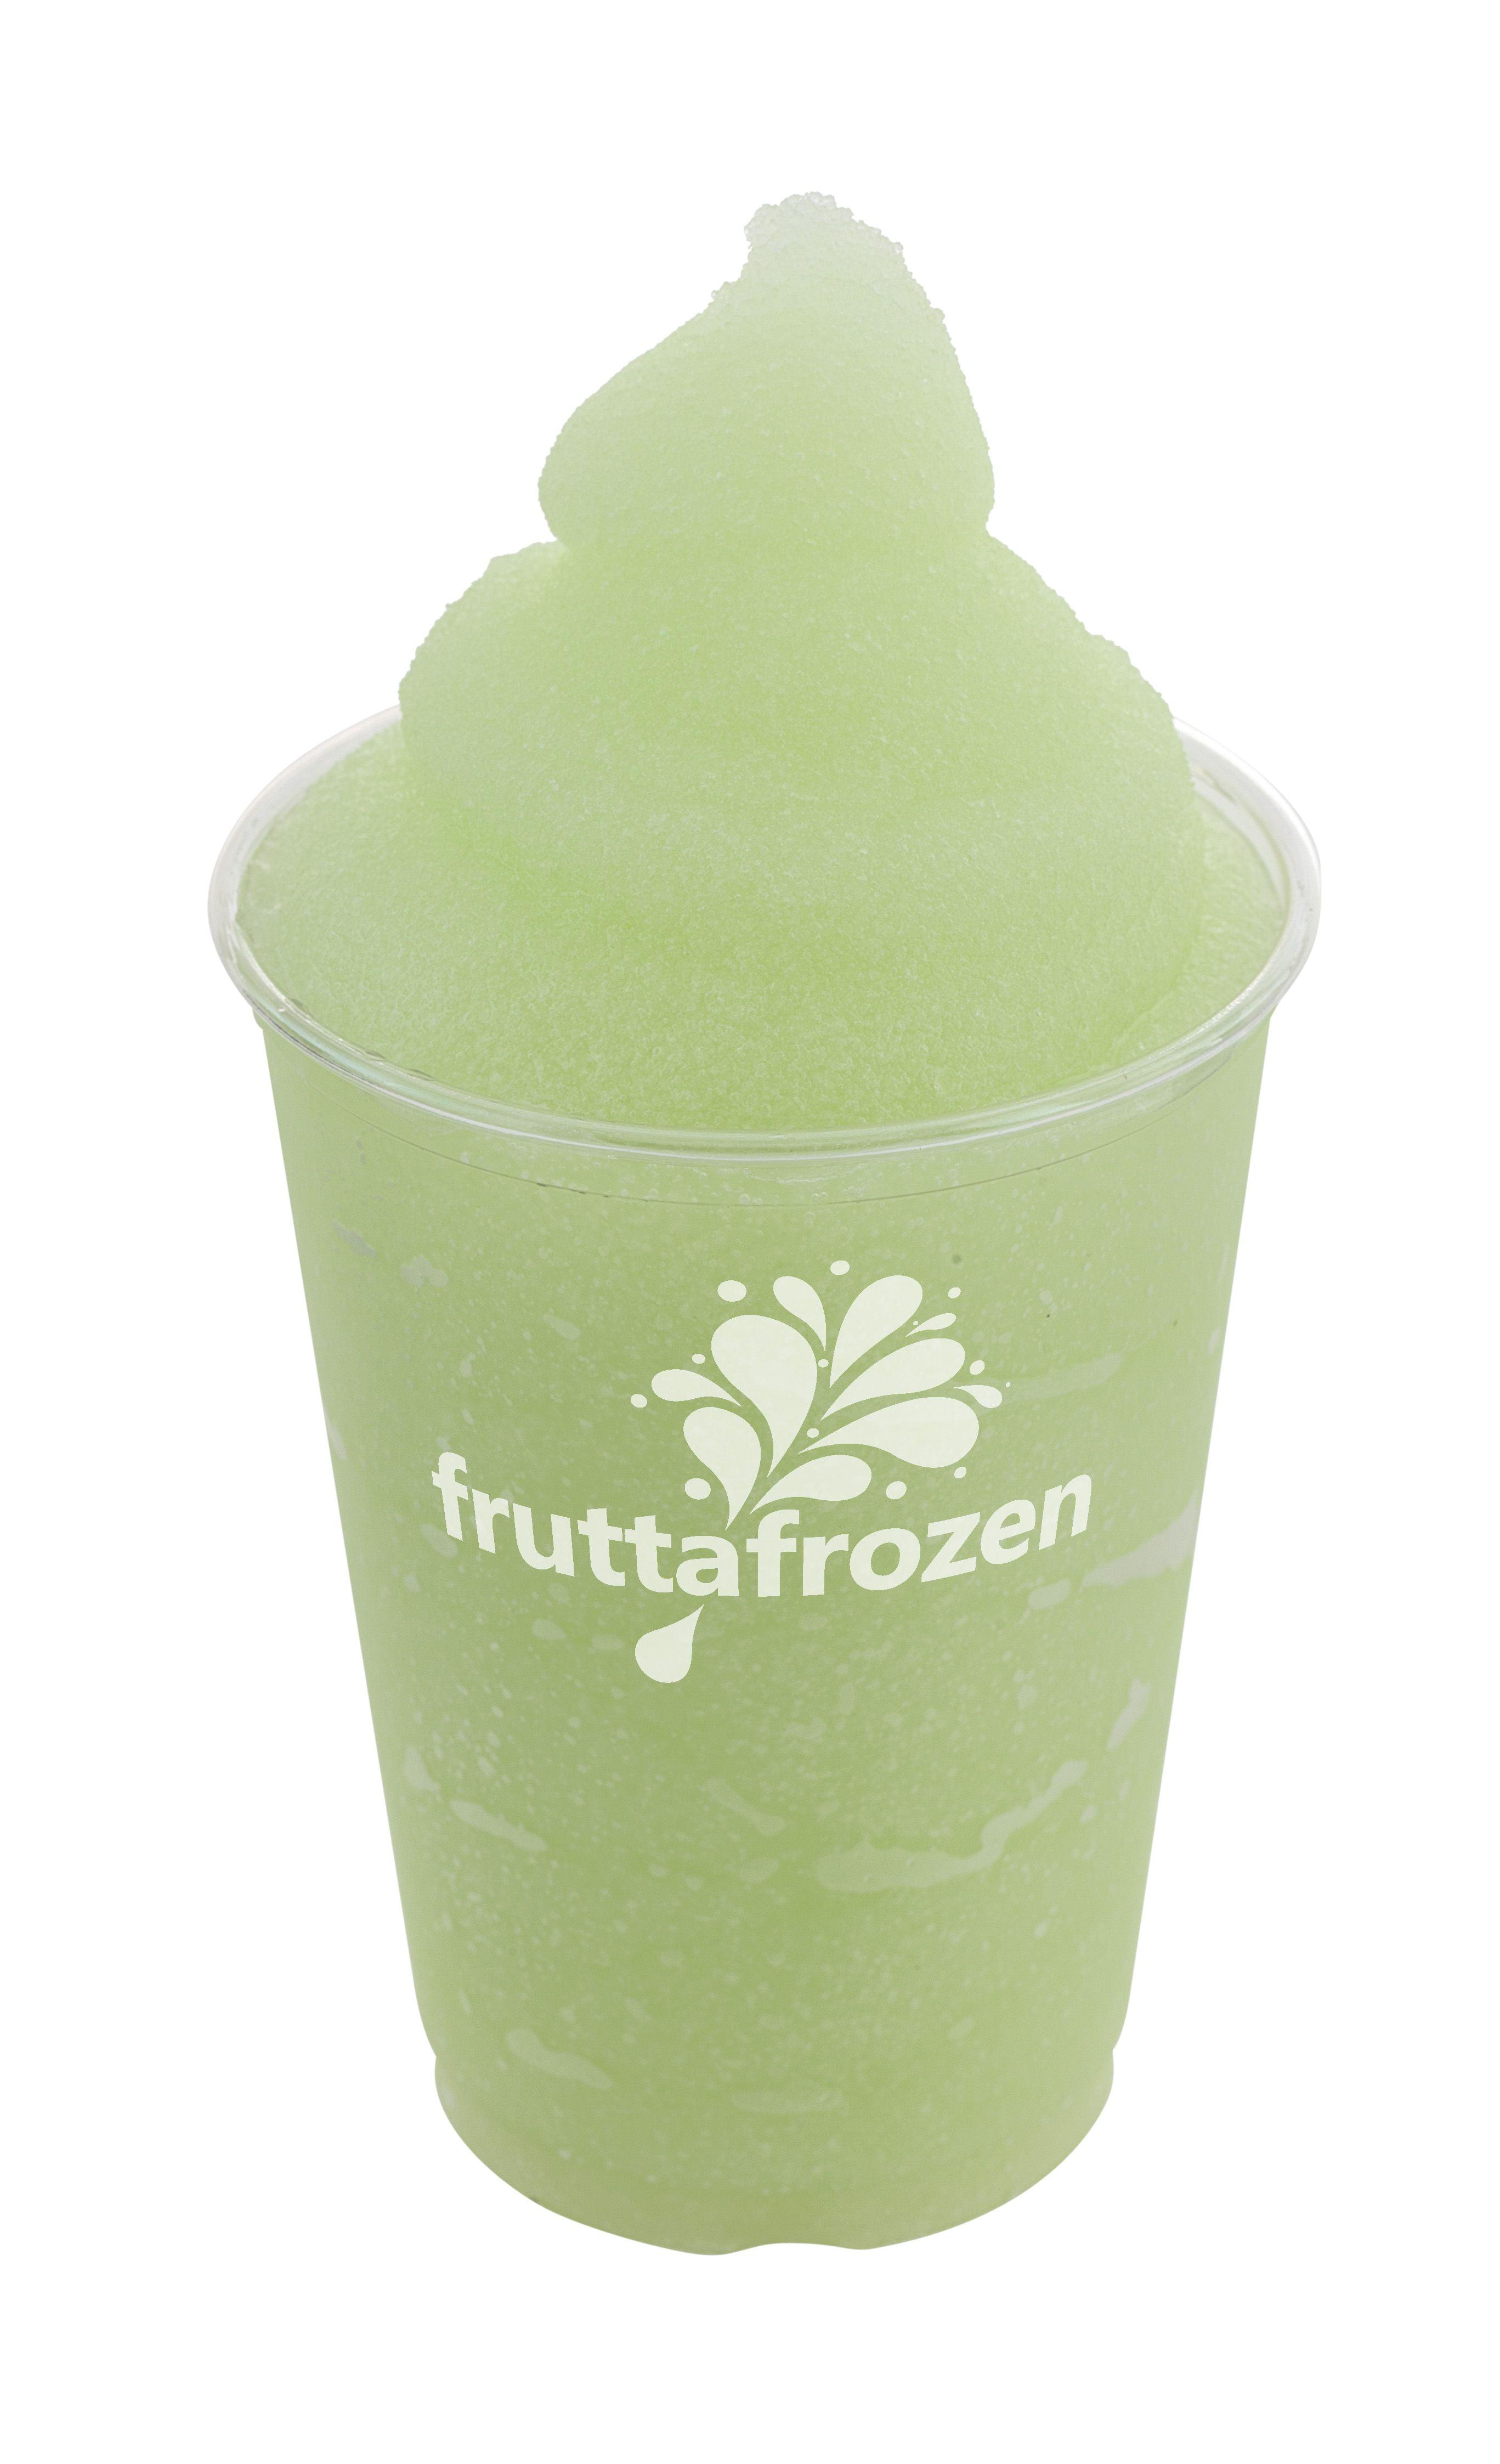 Base em Pó para Bebida Frozen - Frutta Frozen - Sabor Limão